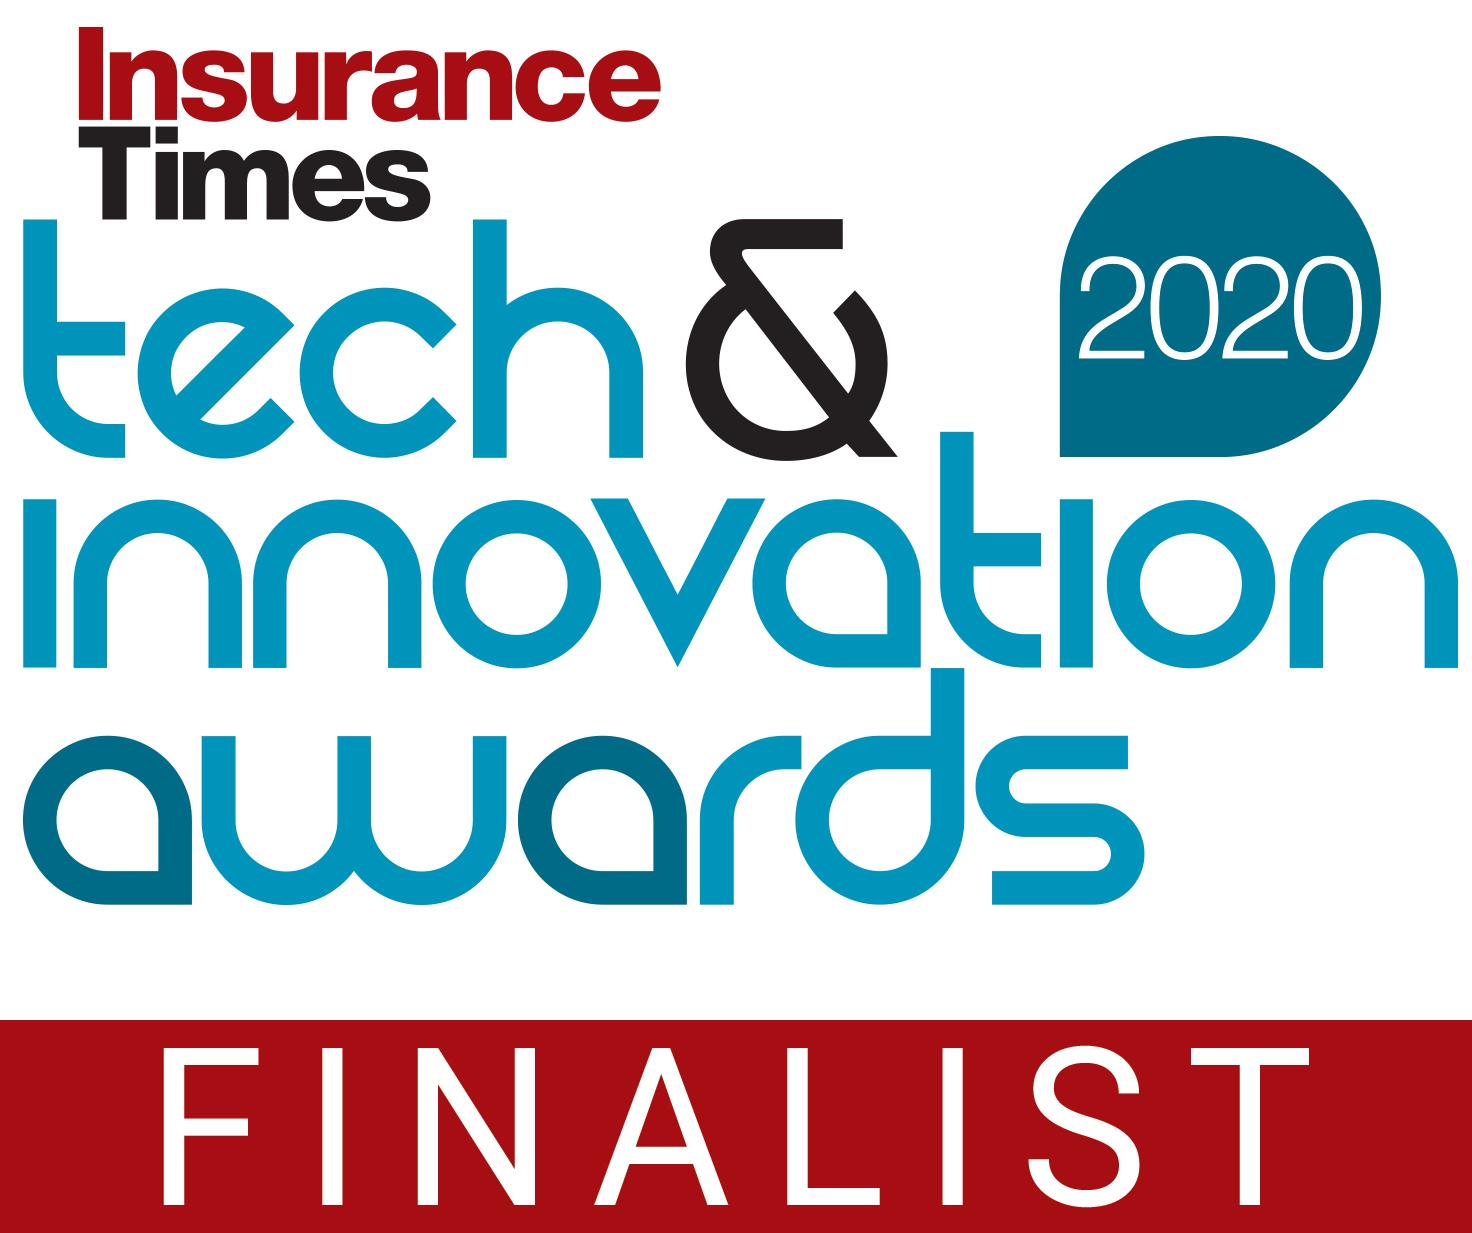 IT Tech & Innovation Awards 2020 Finalist's logo